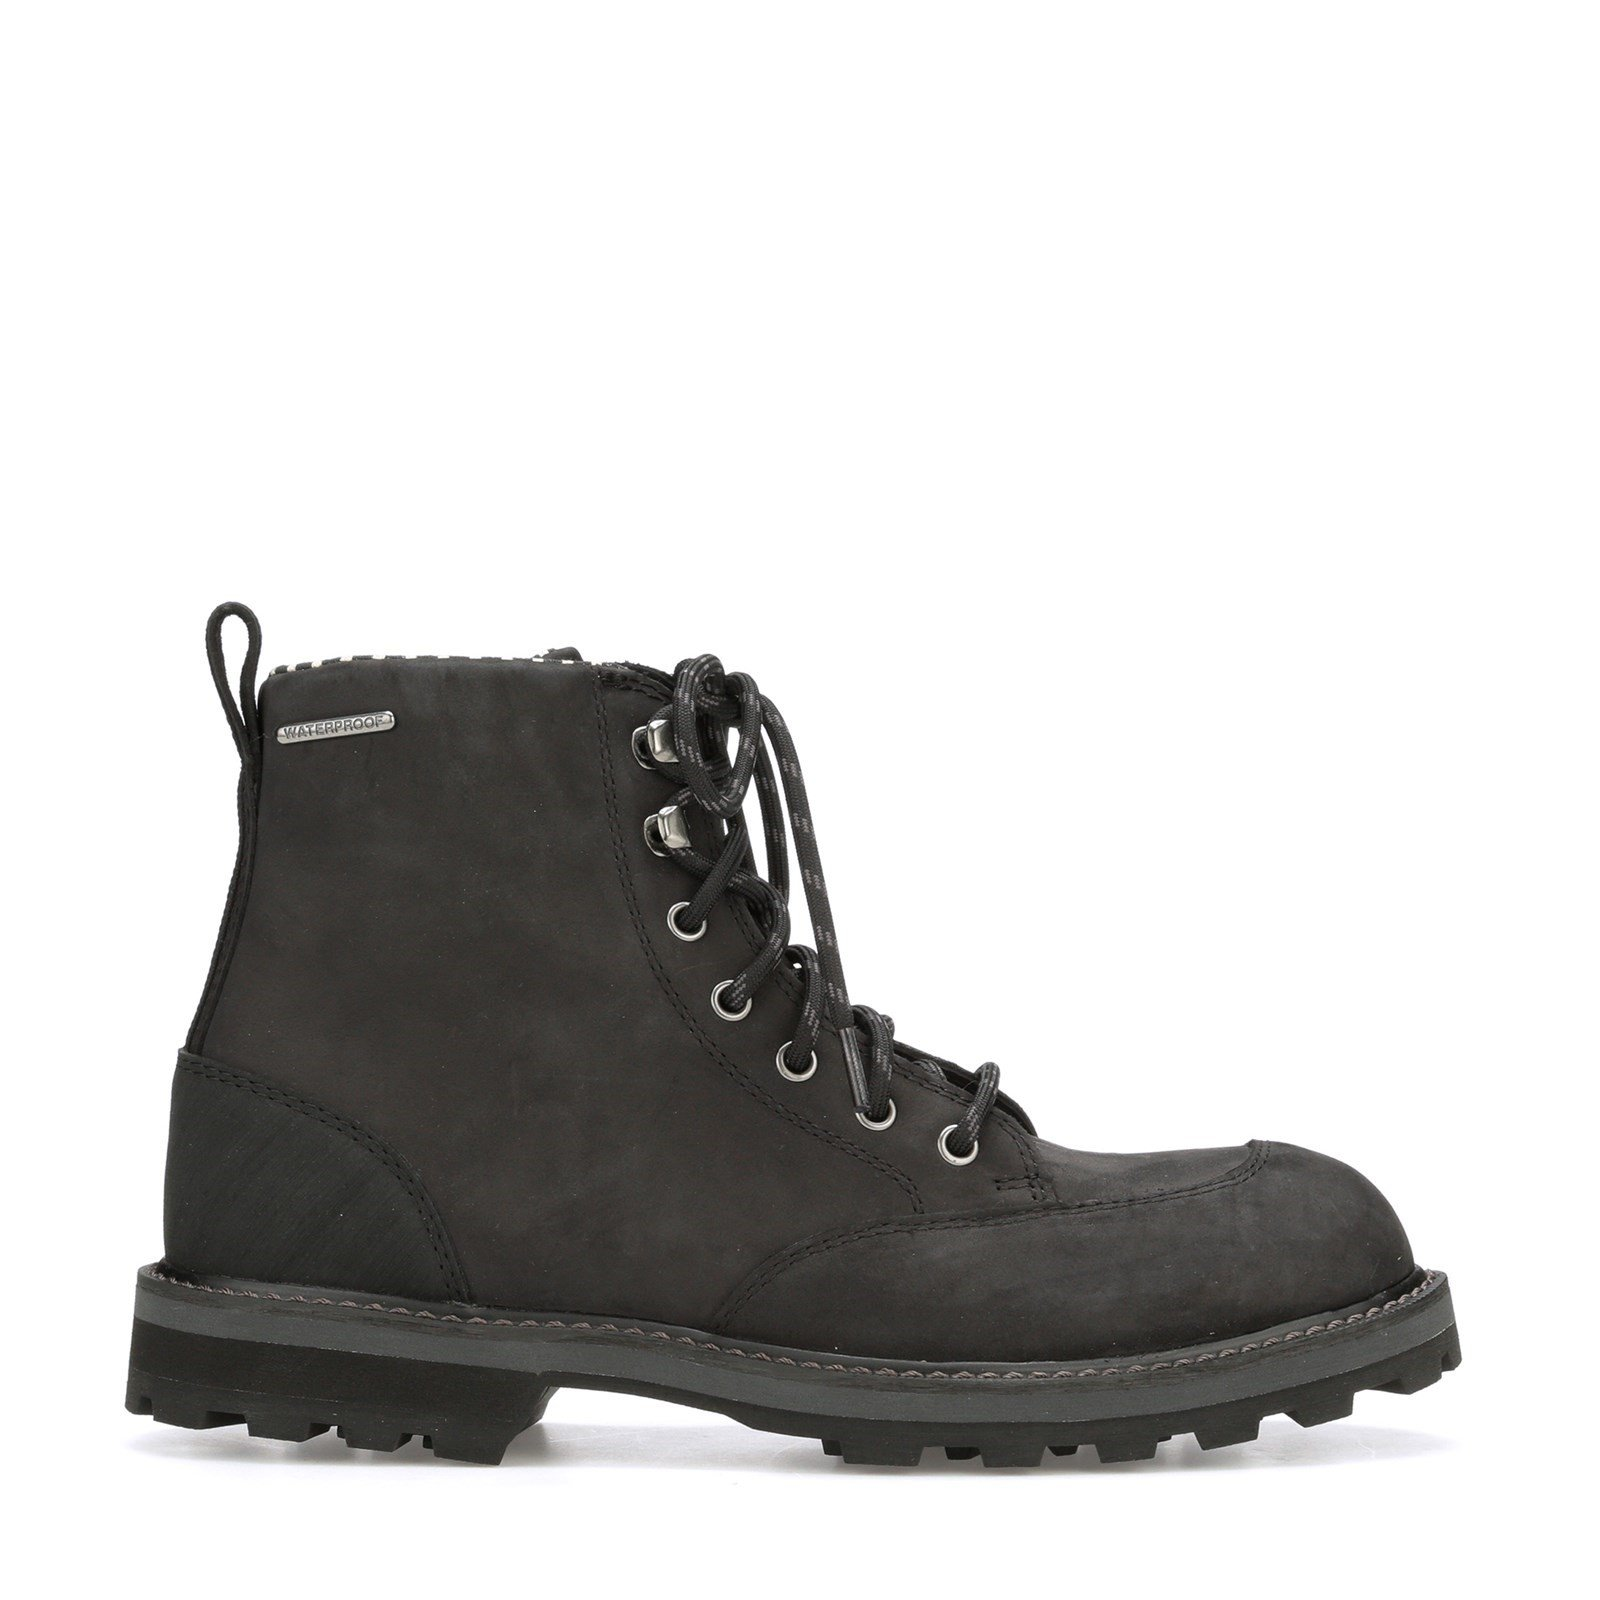 Muck Boots Men's Foreman Boot Black 31854 - Black 8.5